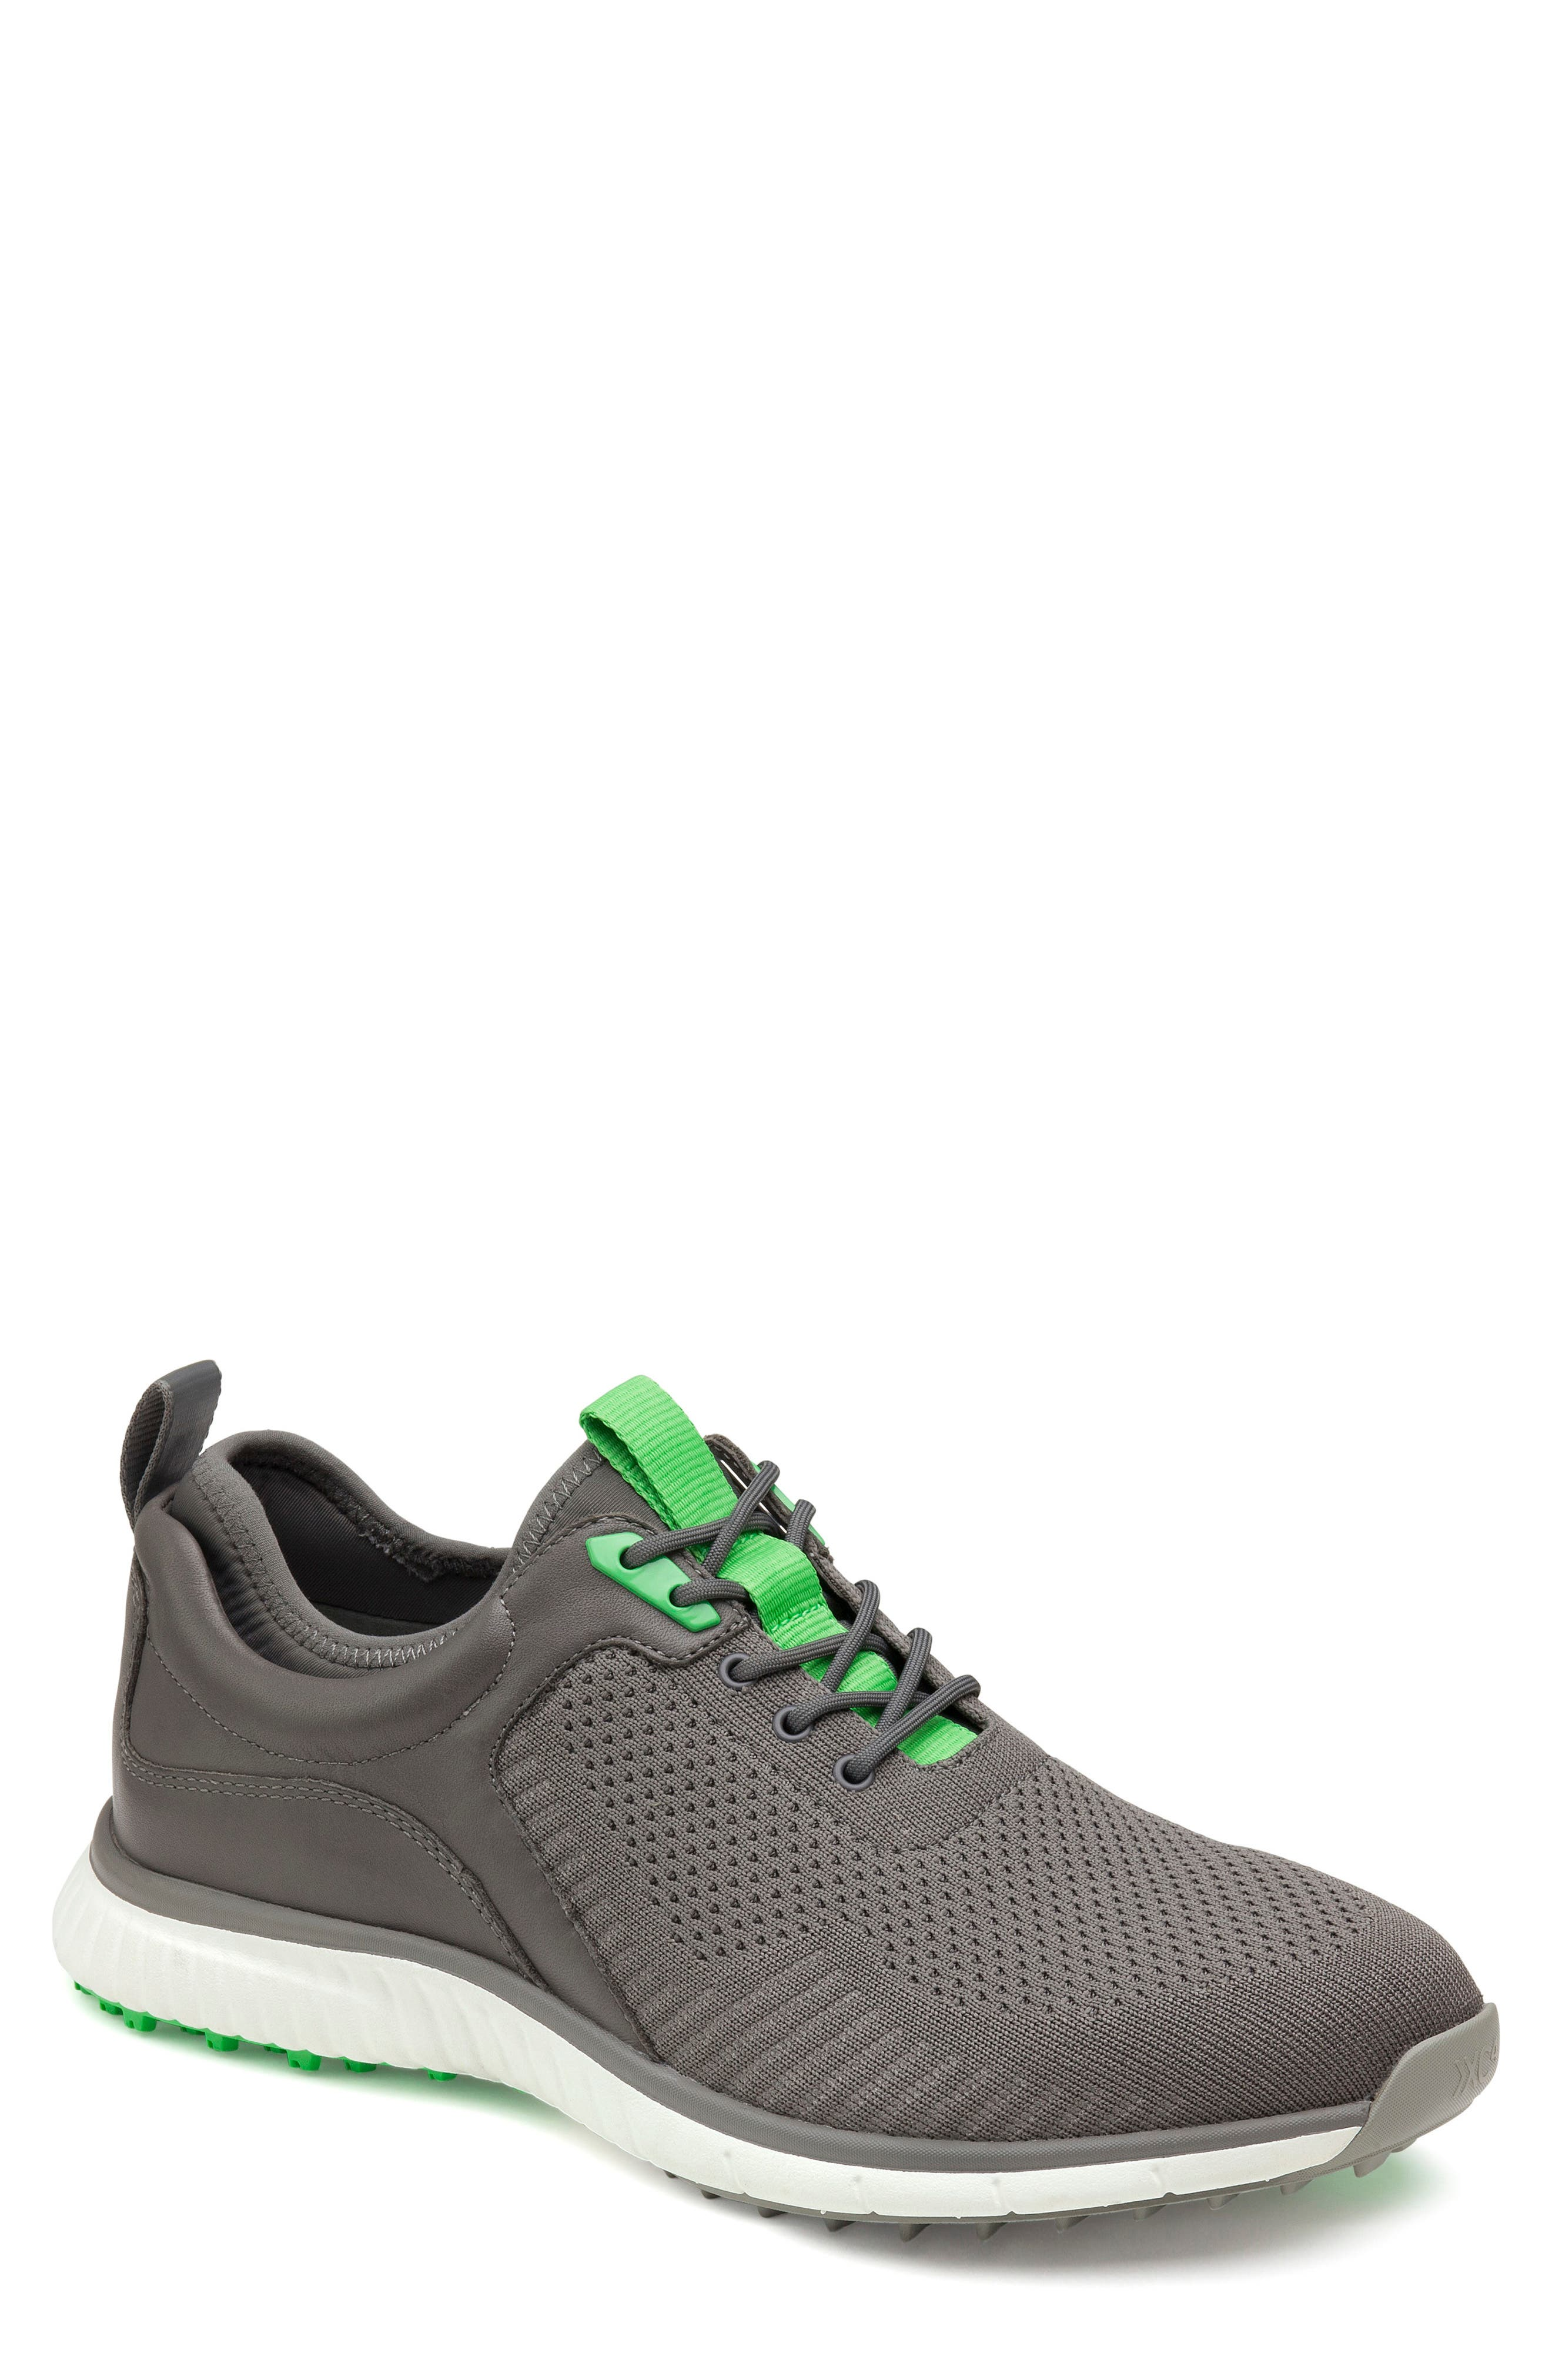 Xc4 H2 Sport Hybrid Knit Golf Sneaker